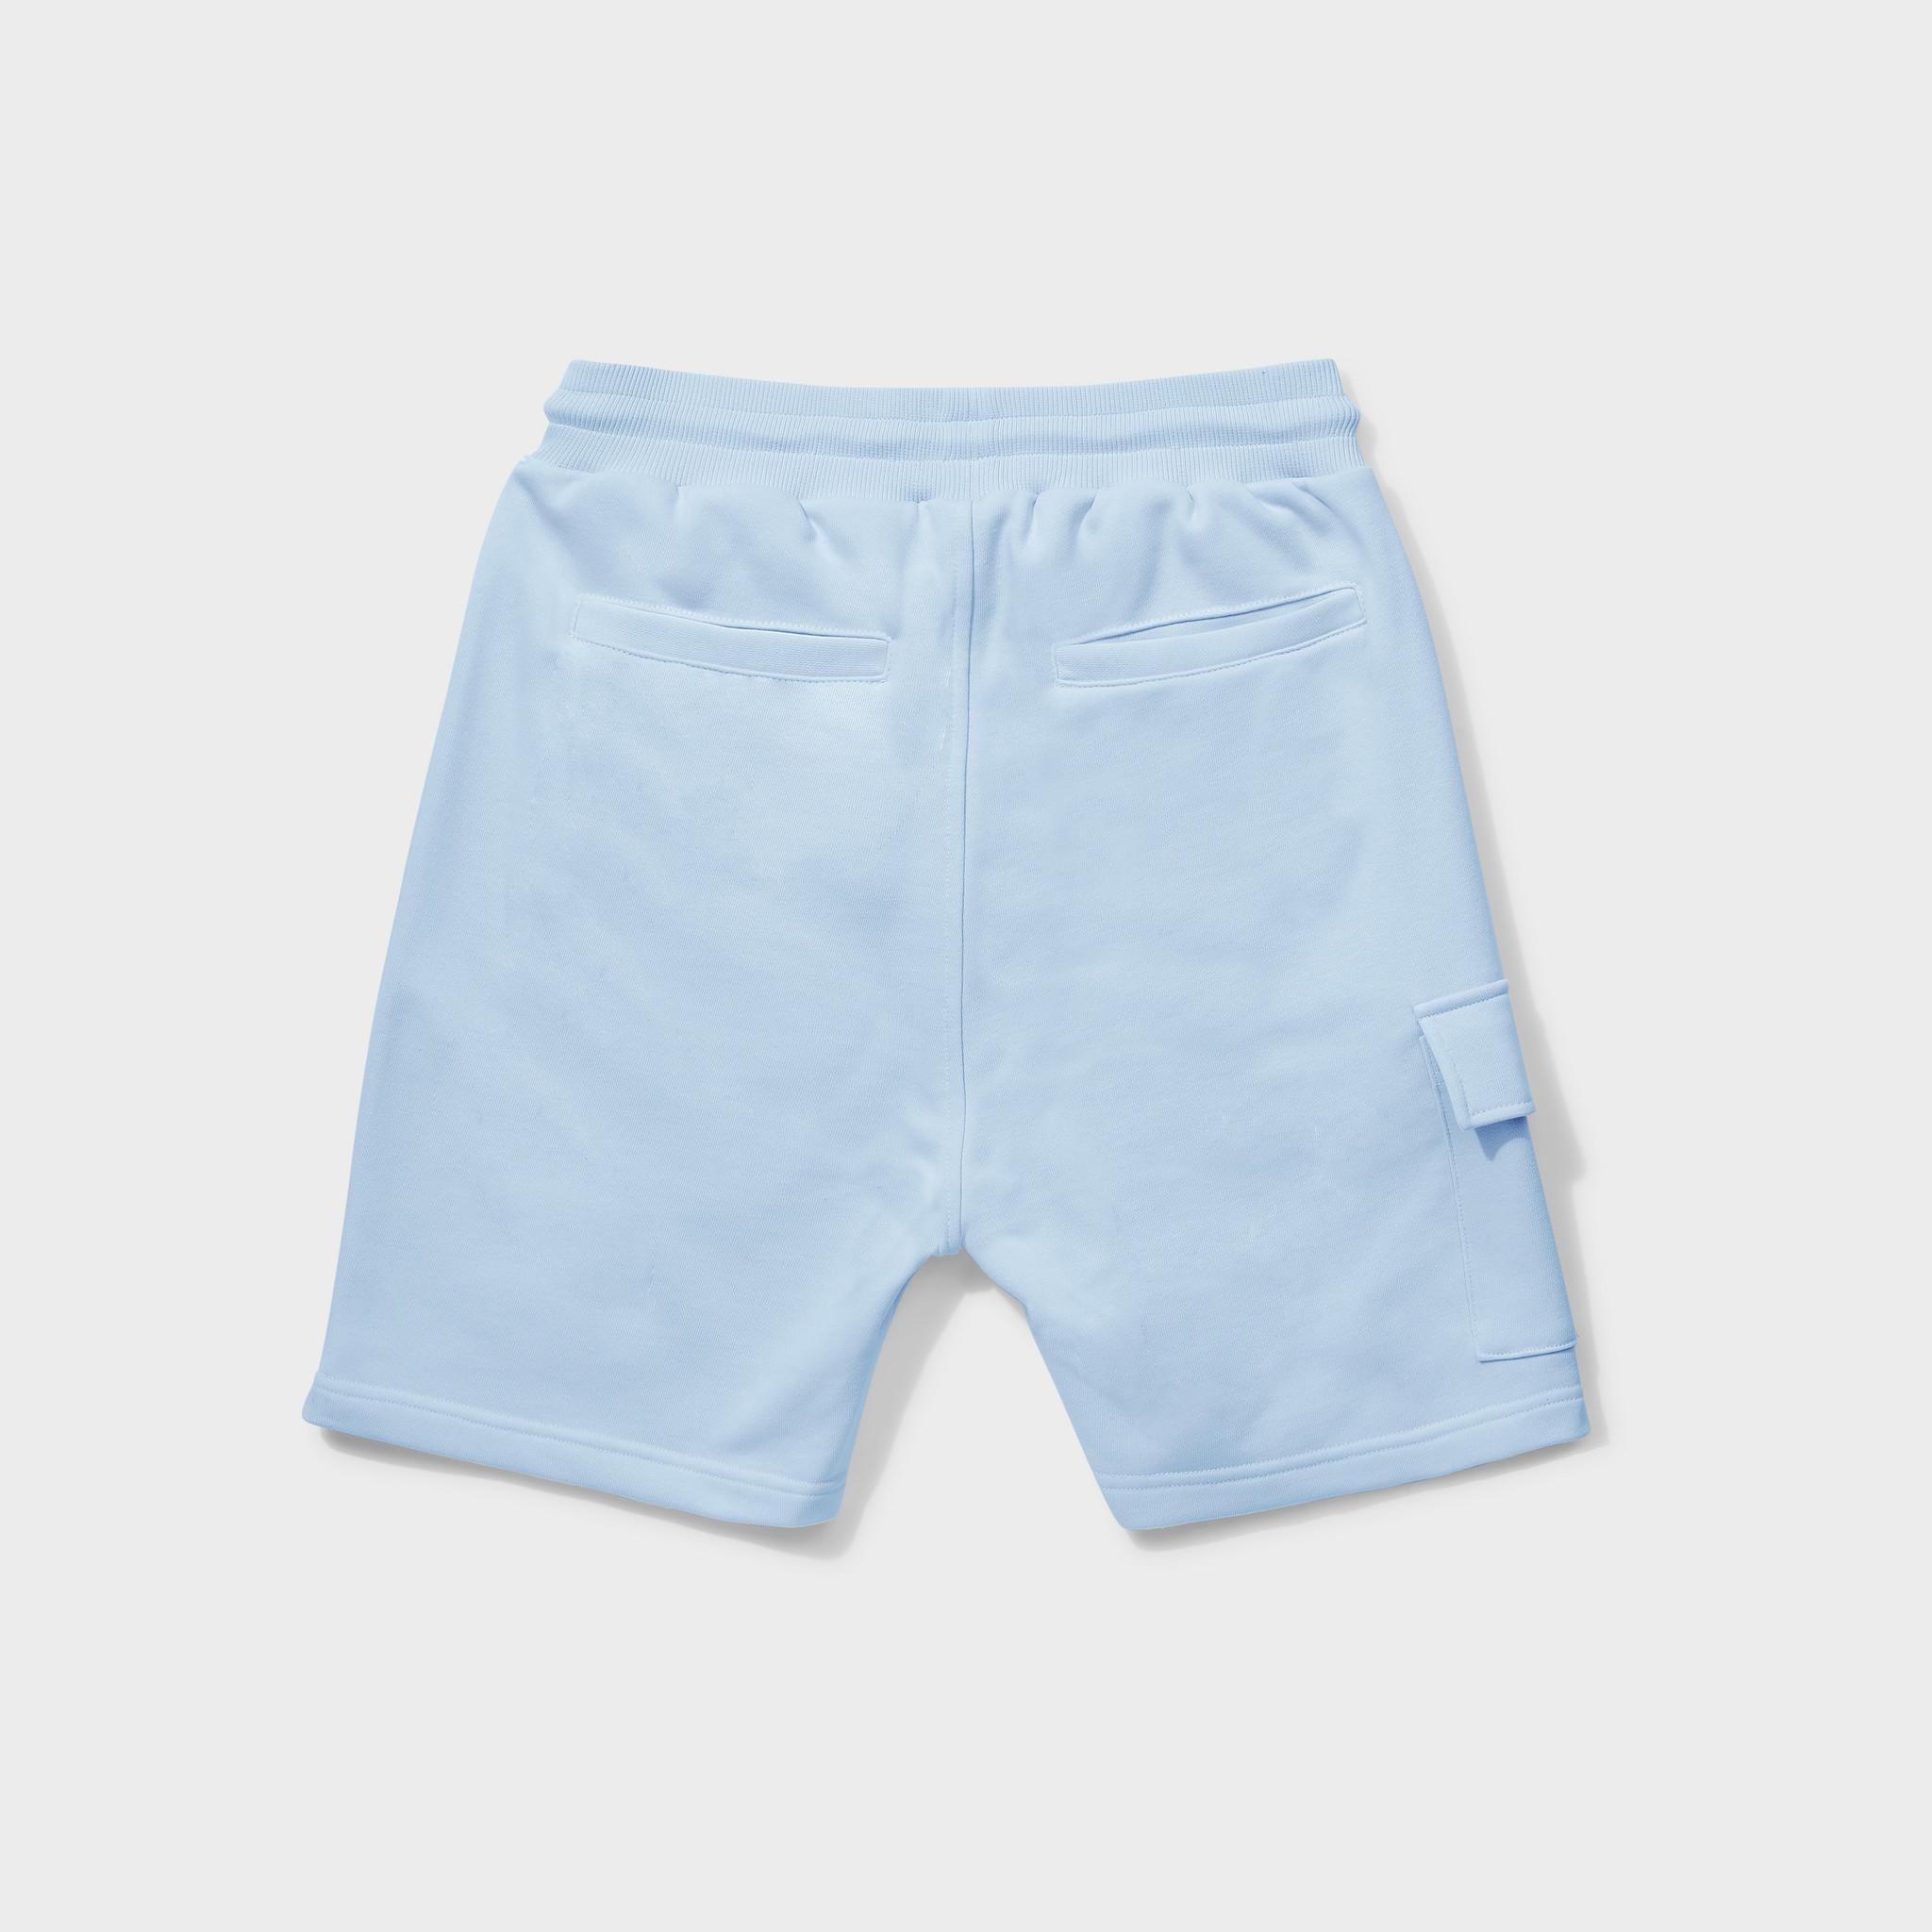 Travis shorts light blue-2